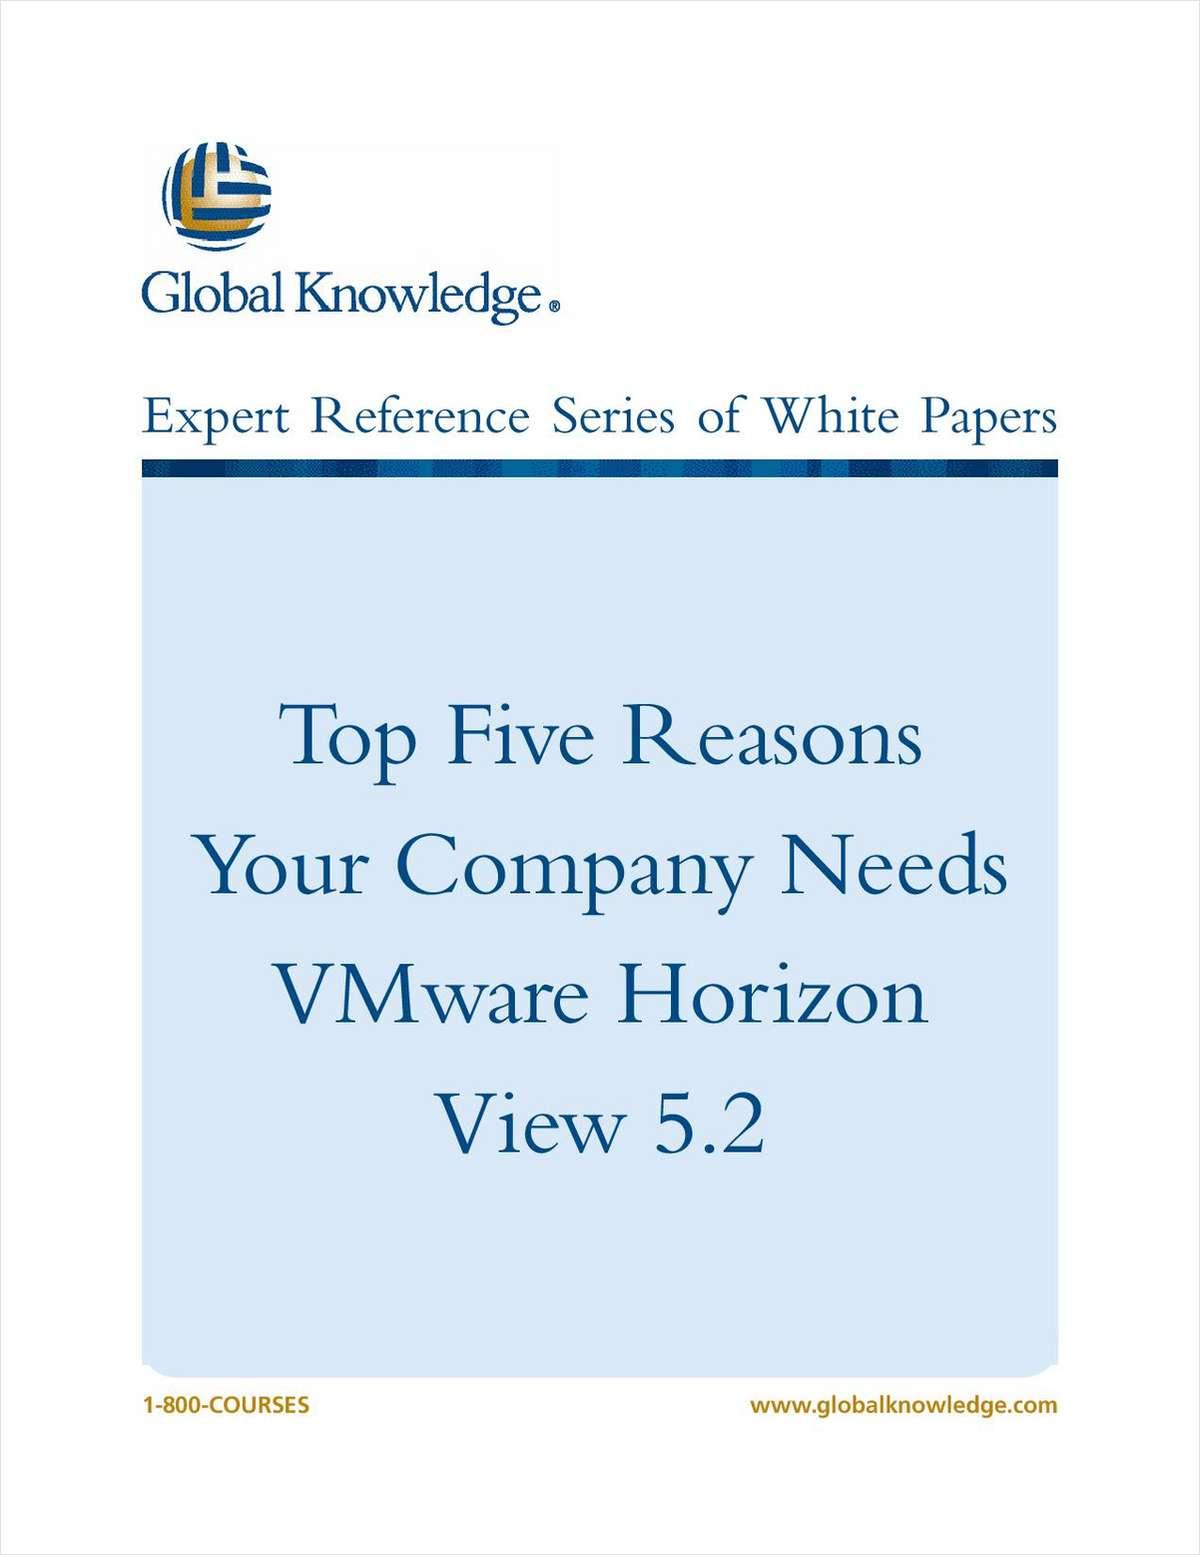 Top Five Reasons Your Company Needs VMware Horizon View 5.2